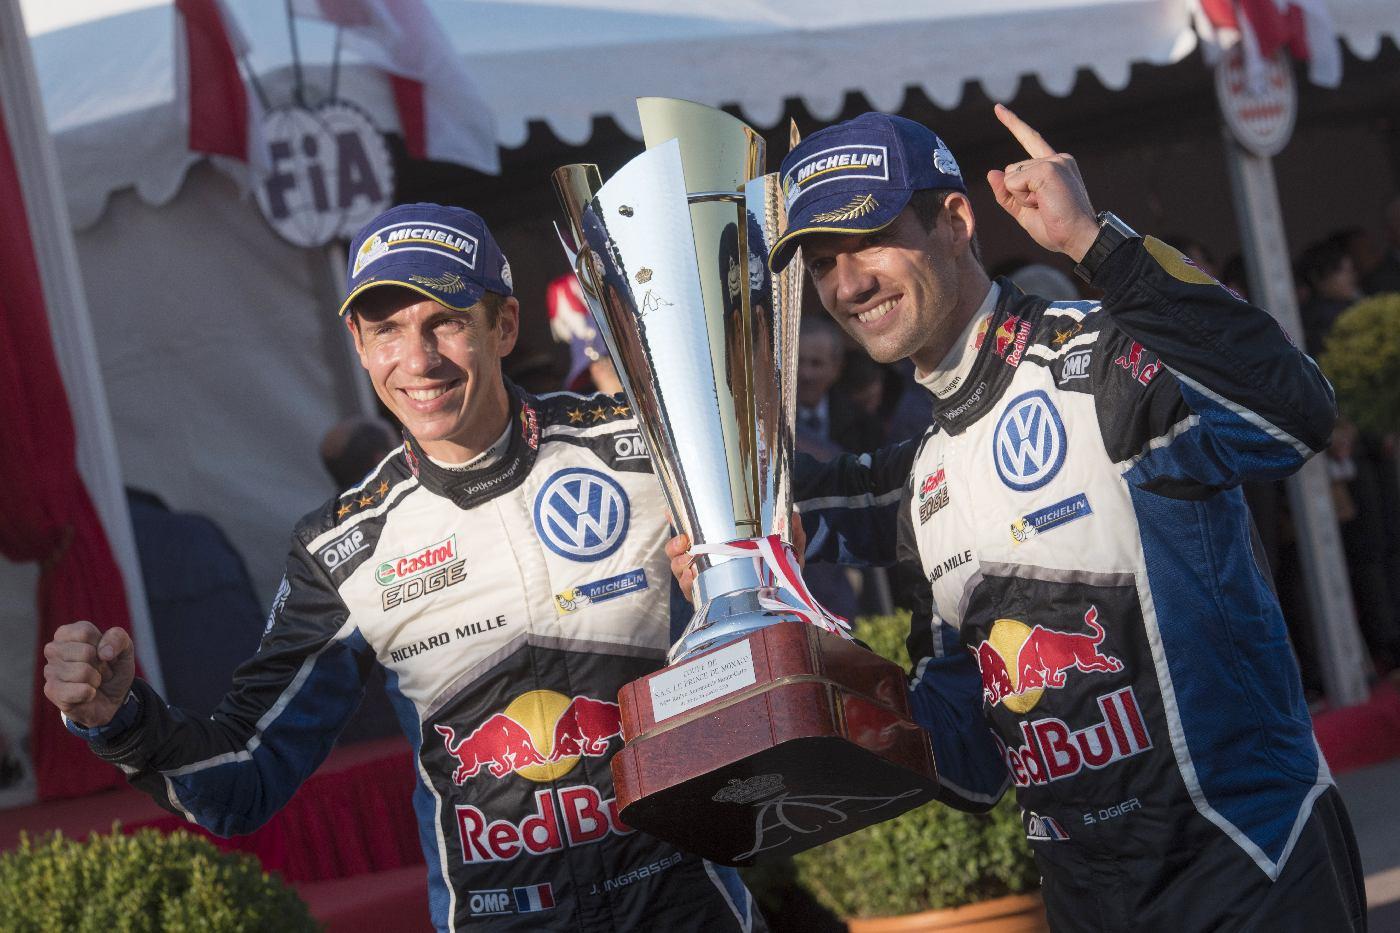 Sebastien Ogier (FRA) , Julienn Ingrassia (FRA) celebrate the podium during the FIA World Rally Championship 2016 in Monte Carlo, Monaco on January 24, 2016